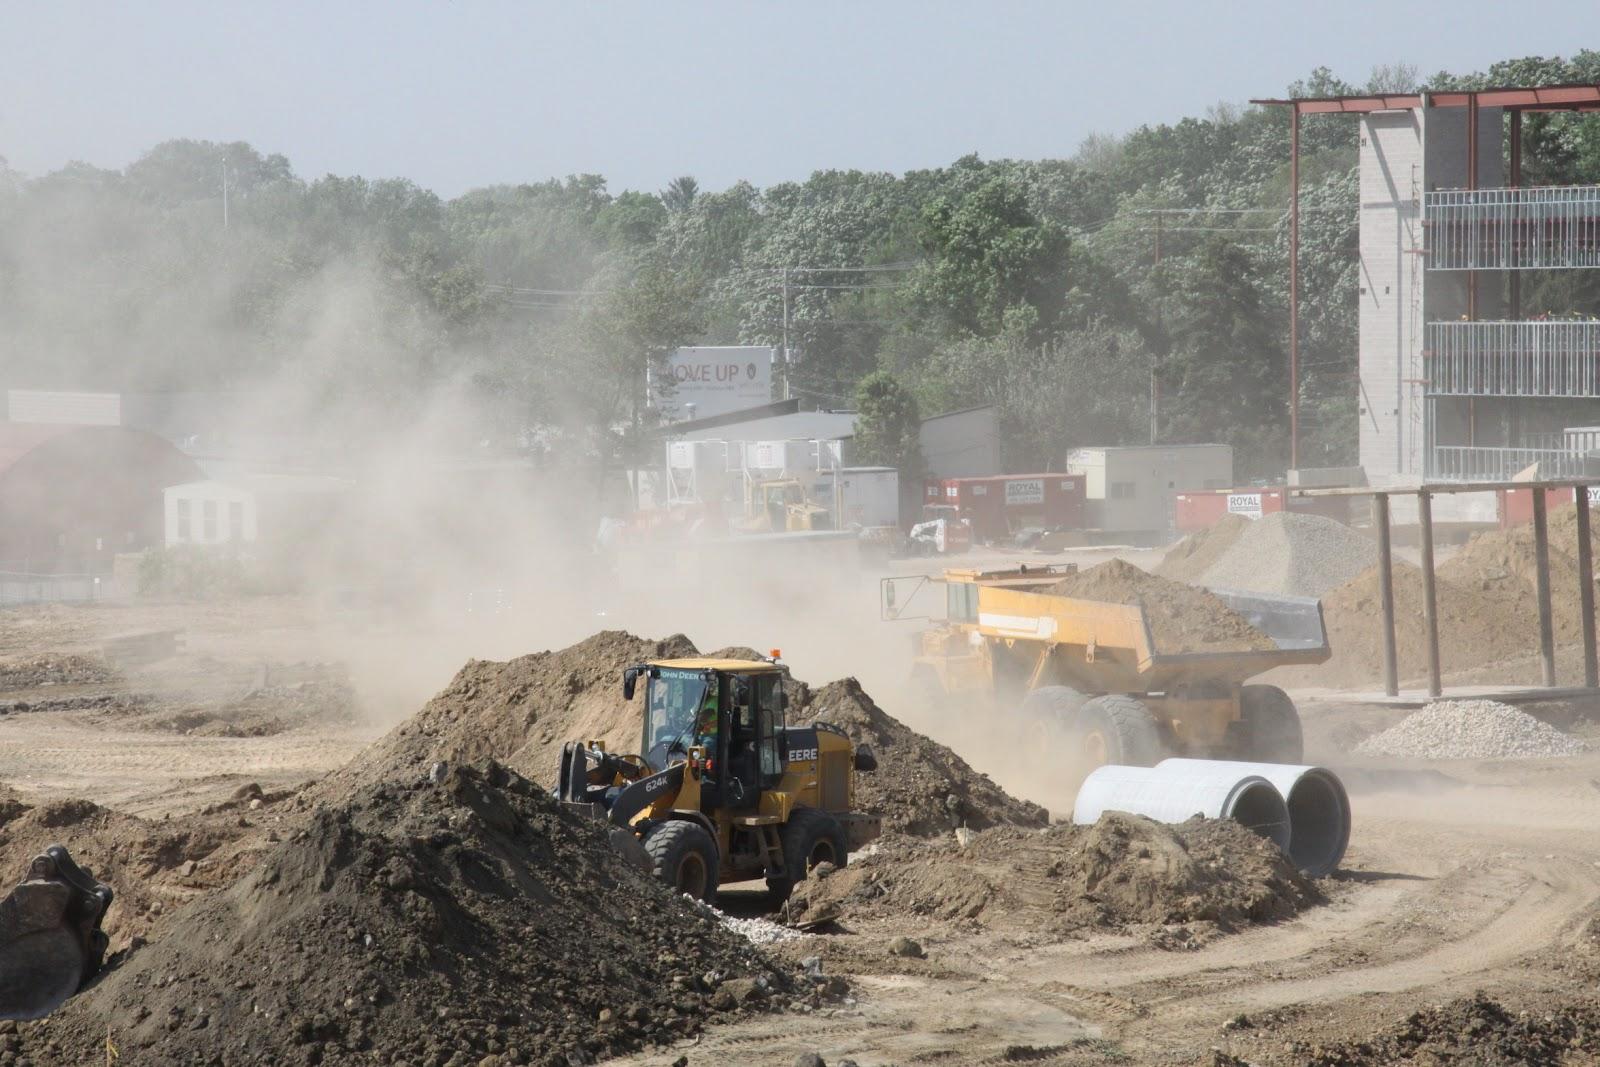 Report: Wildfires & Air Pollution, A Hidden Hazard